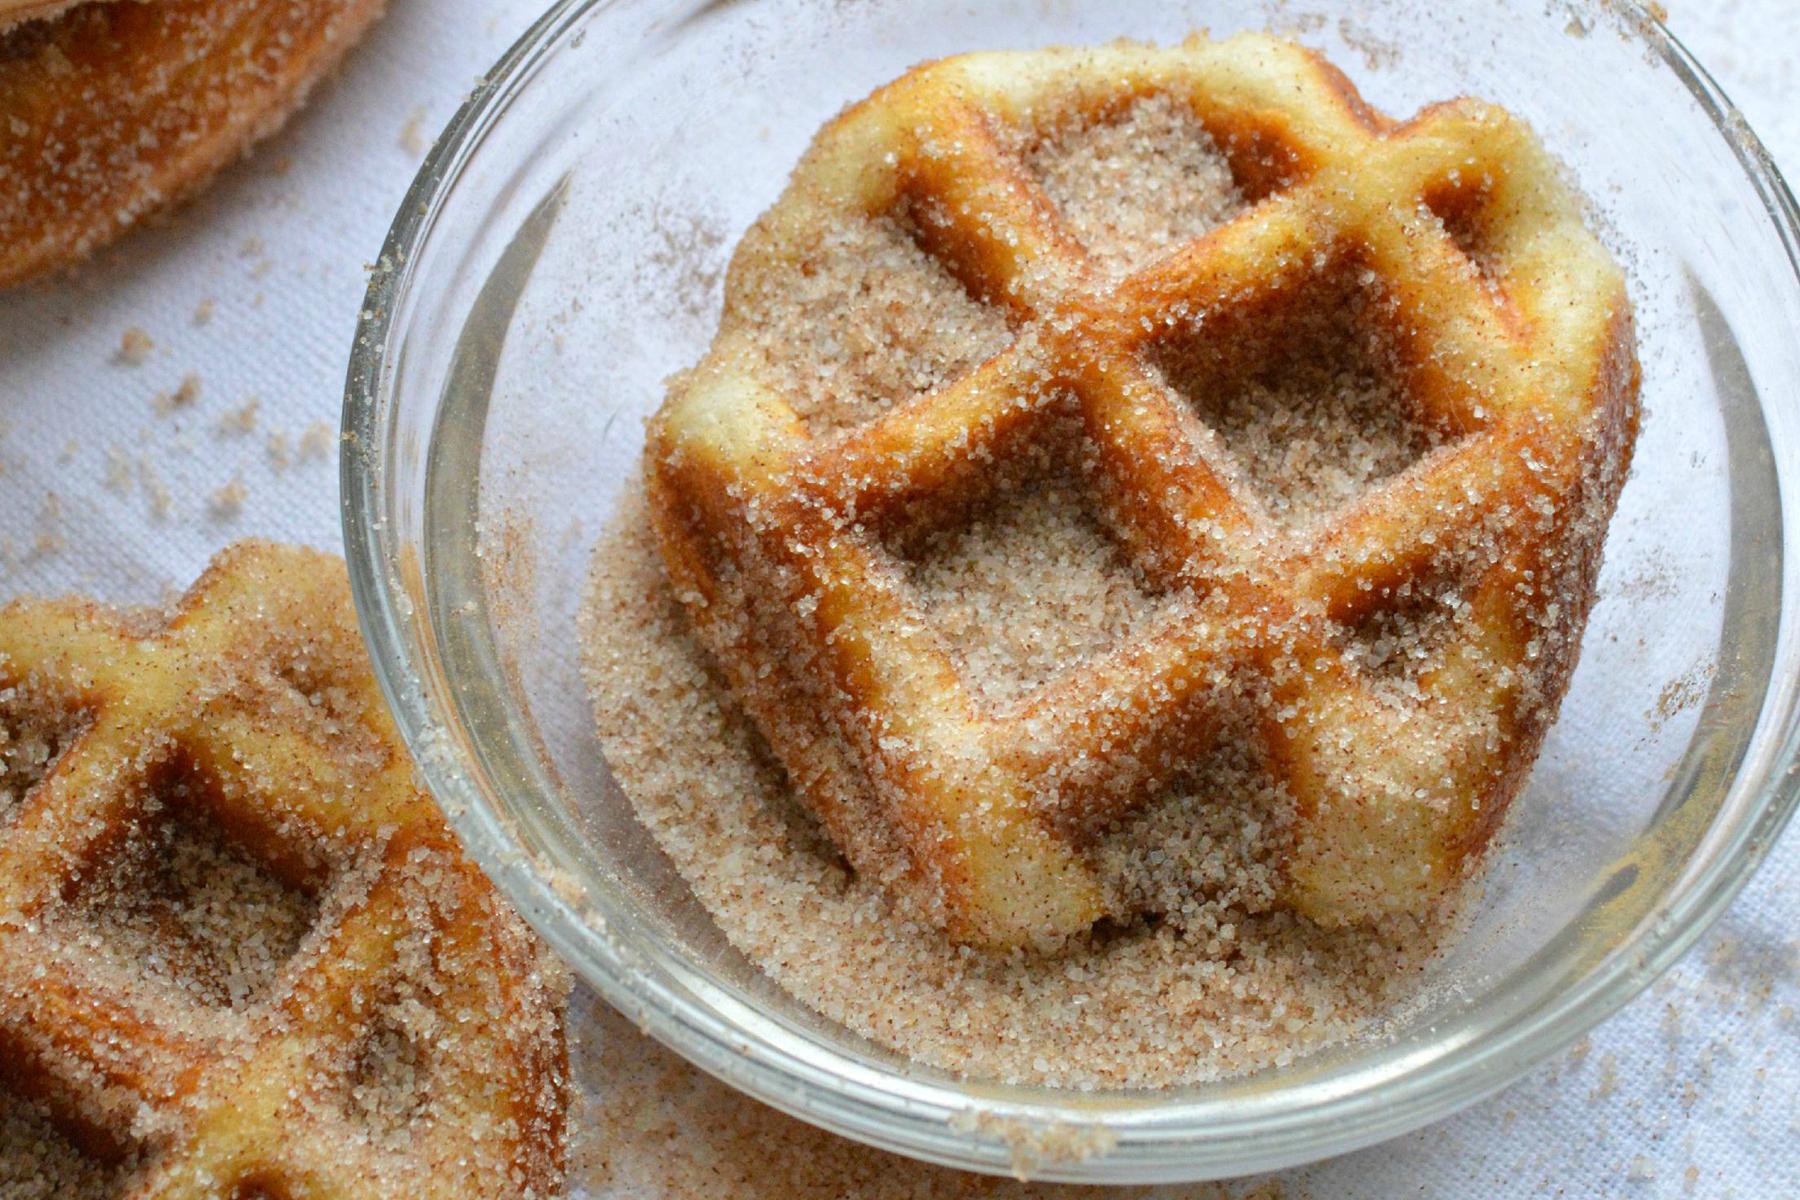 Unbelievable 5 Minute Cinnamon Sugar Waffle Bites | The Huffington ...